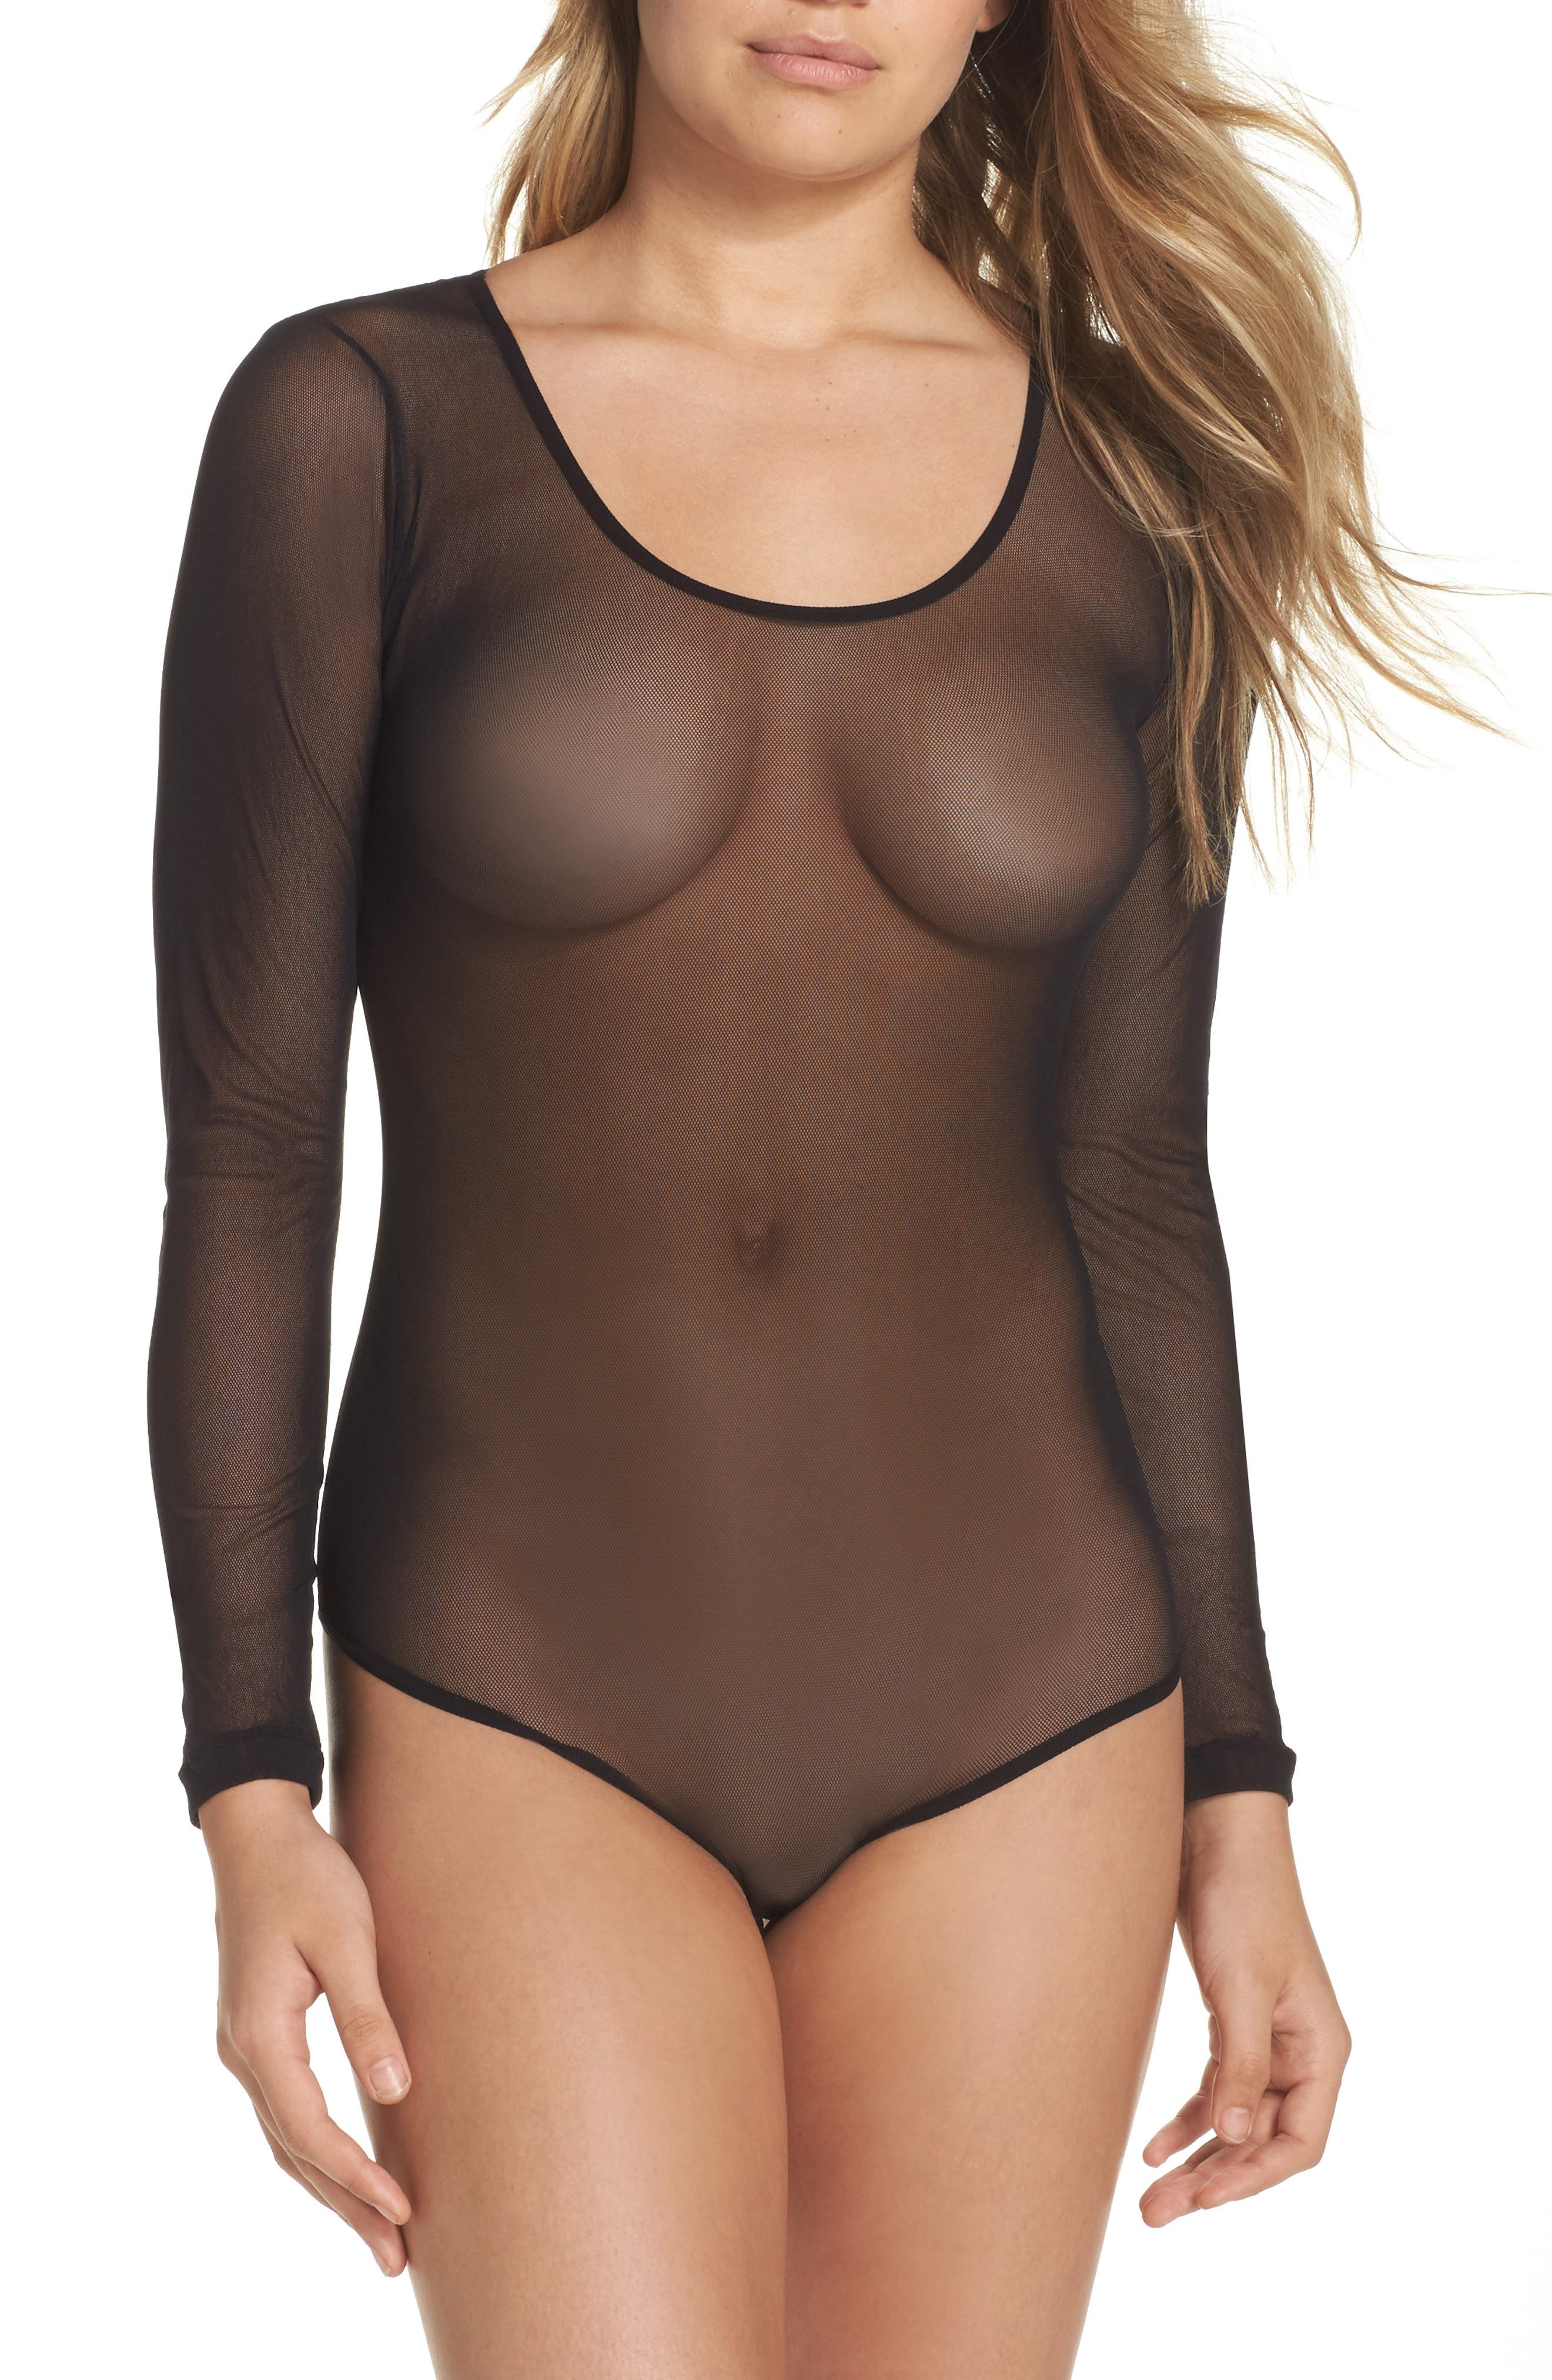 Cosabella Soire Thong Bodysuit